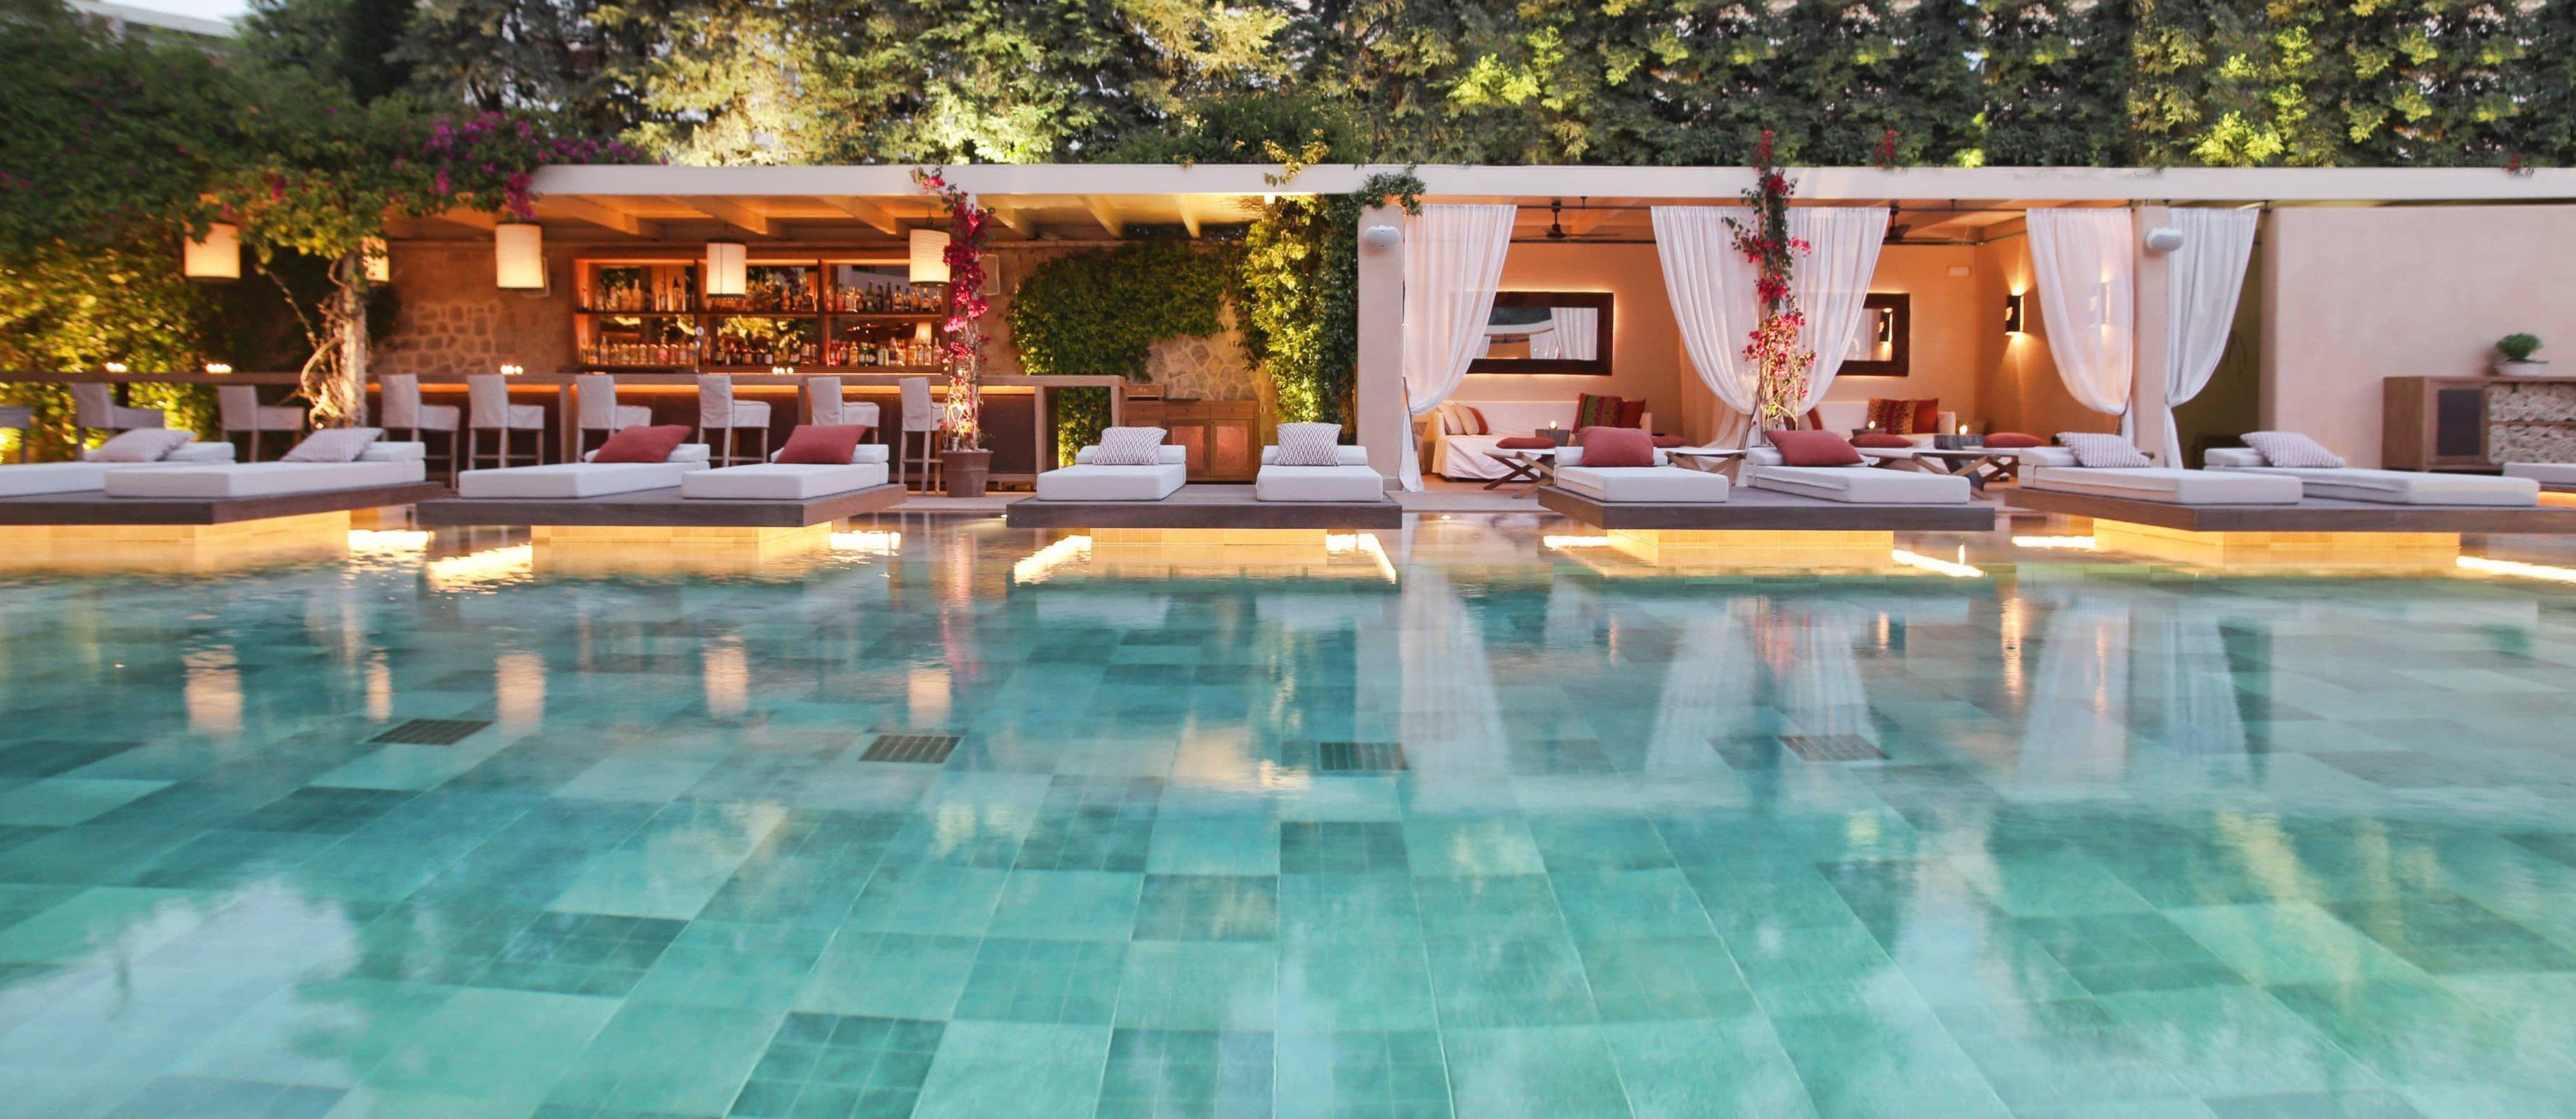 the-margi-hotel-athenian-riviera